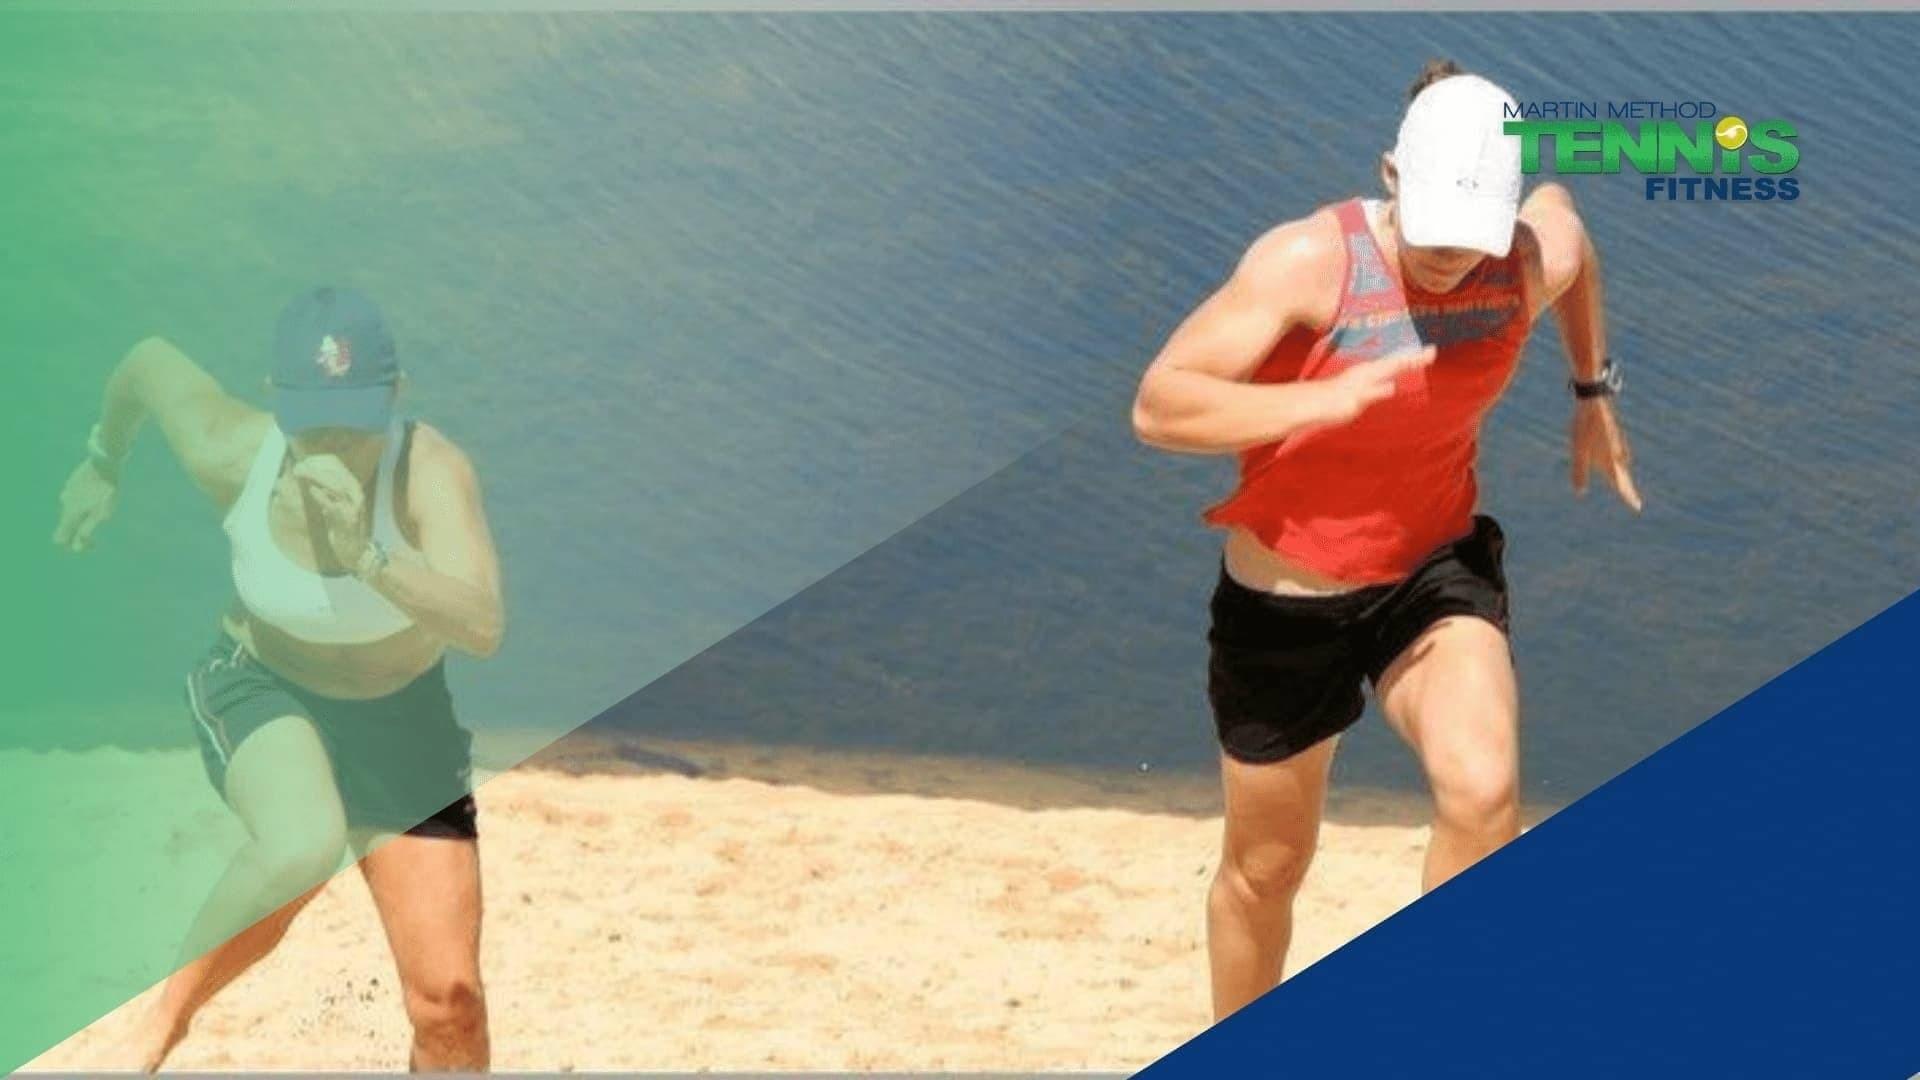 tennis-aerobic-conditioning-training